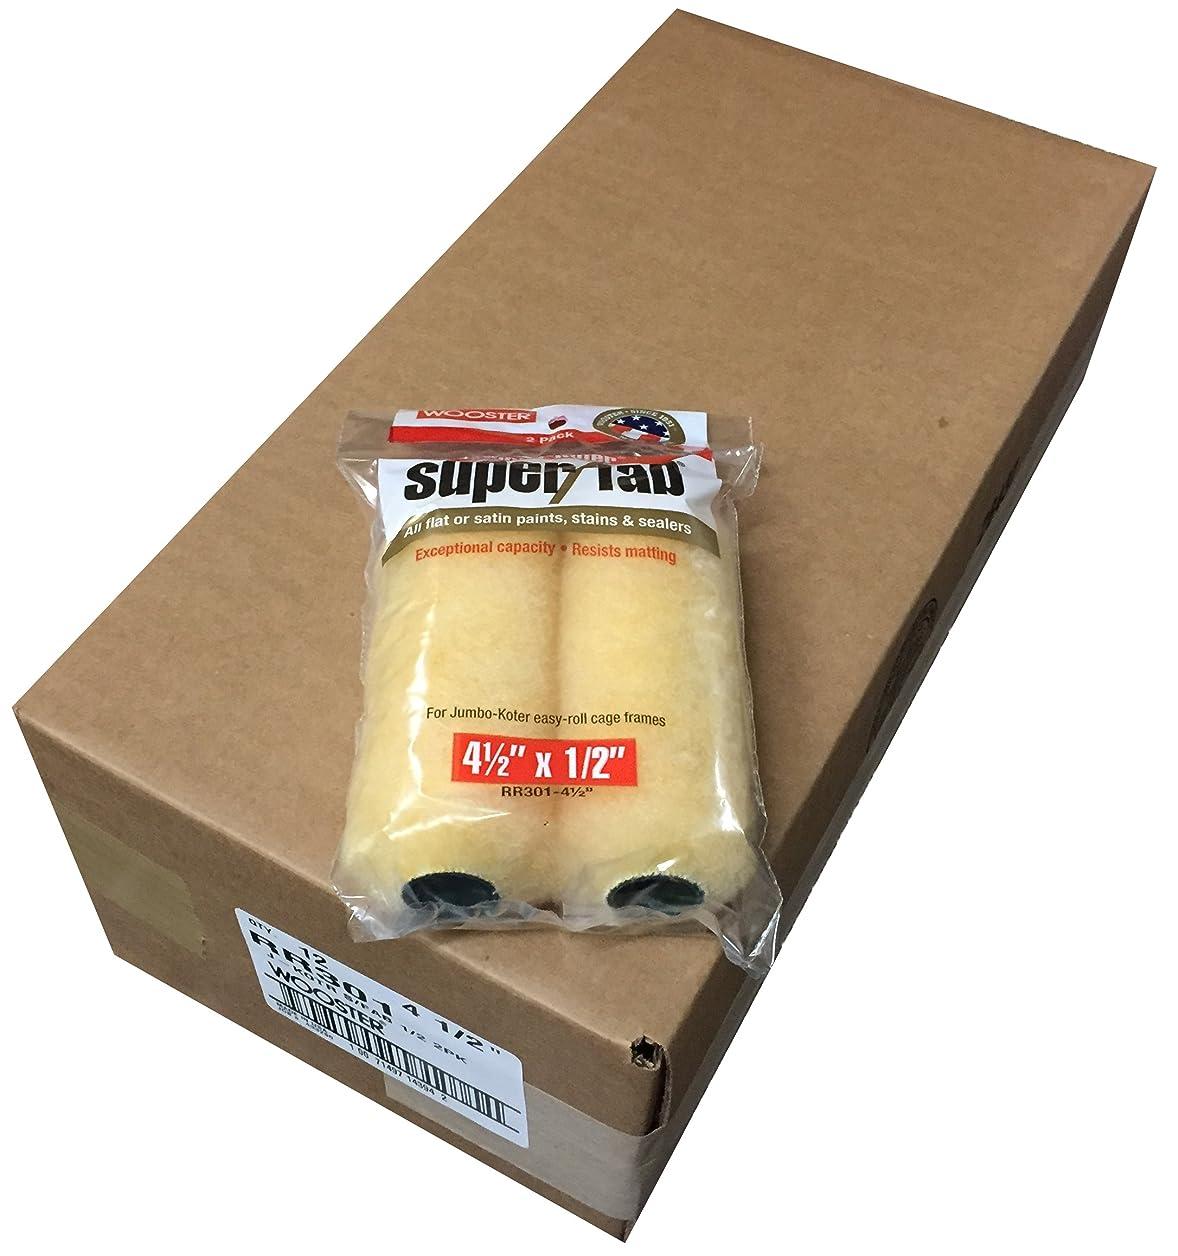 Wooster Brush RR301-4-1/2 Jumbo-Koter Super/Fab Roller, 1/2-Inch Nap, 2 Packs, Pack of 12 uwlagnafuewufdfx